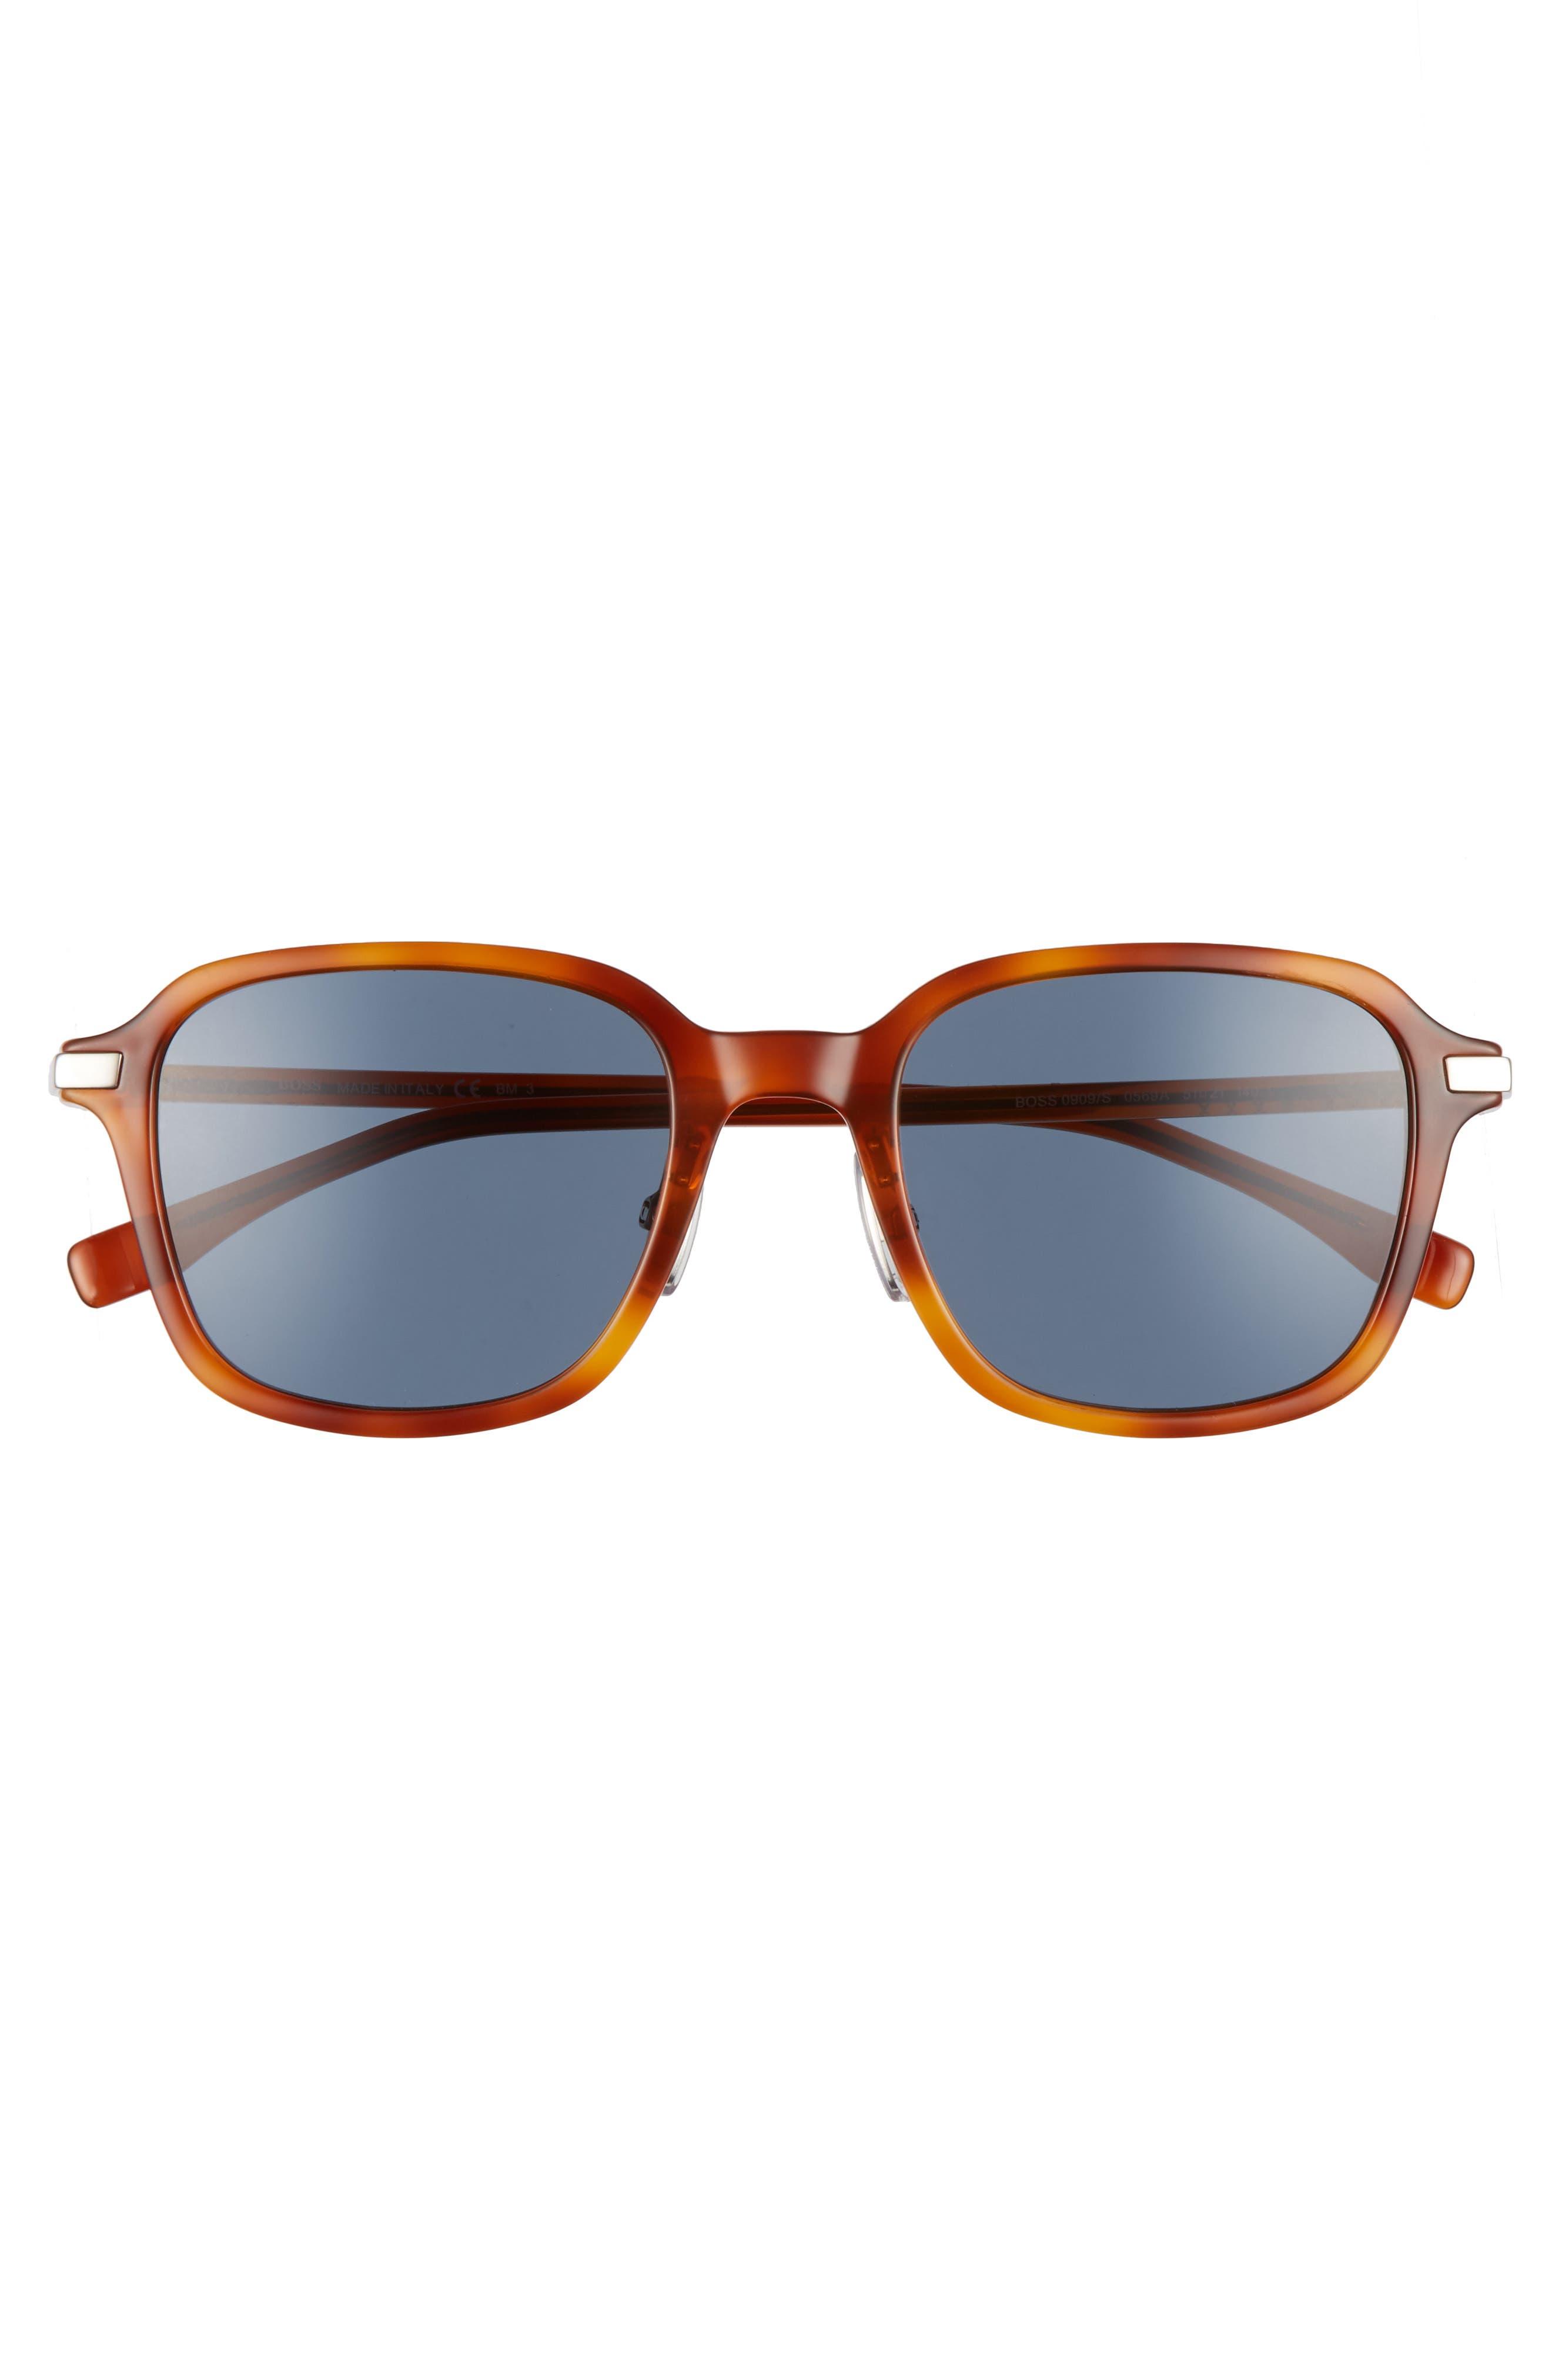 0909S 51mm Sunglasses,                             Alternate thumbnail 2, color,                             210